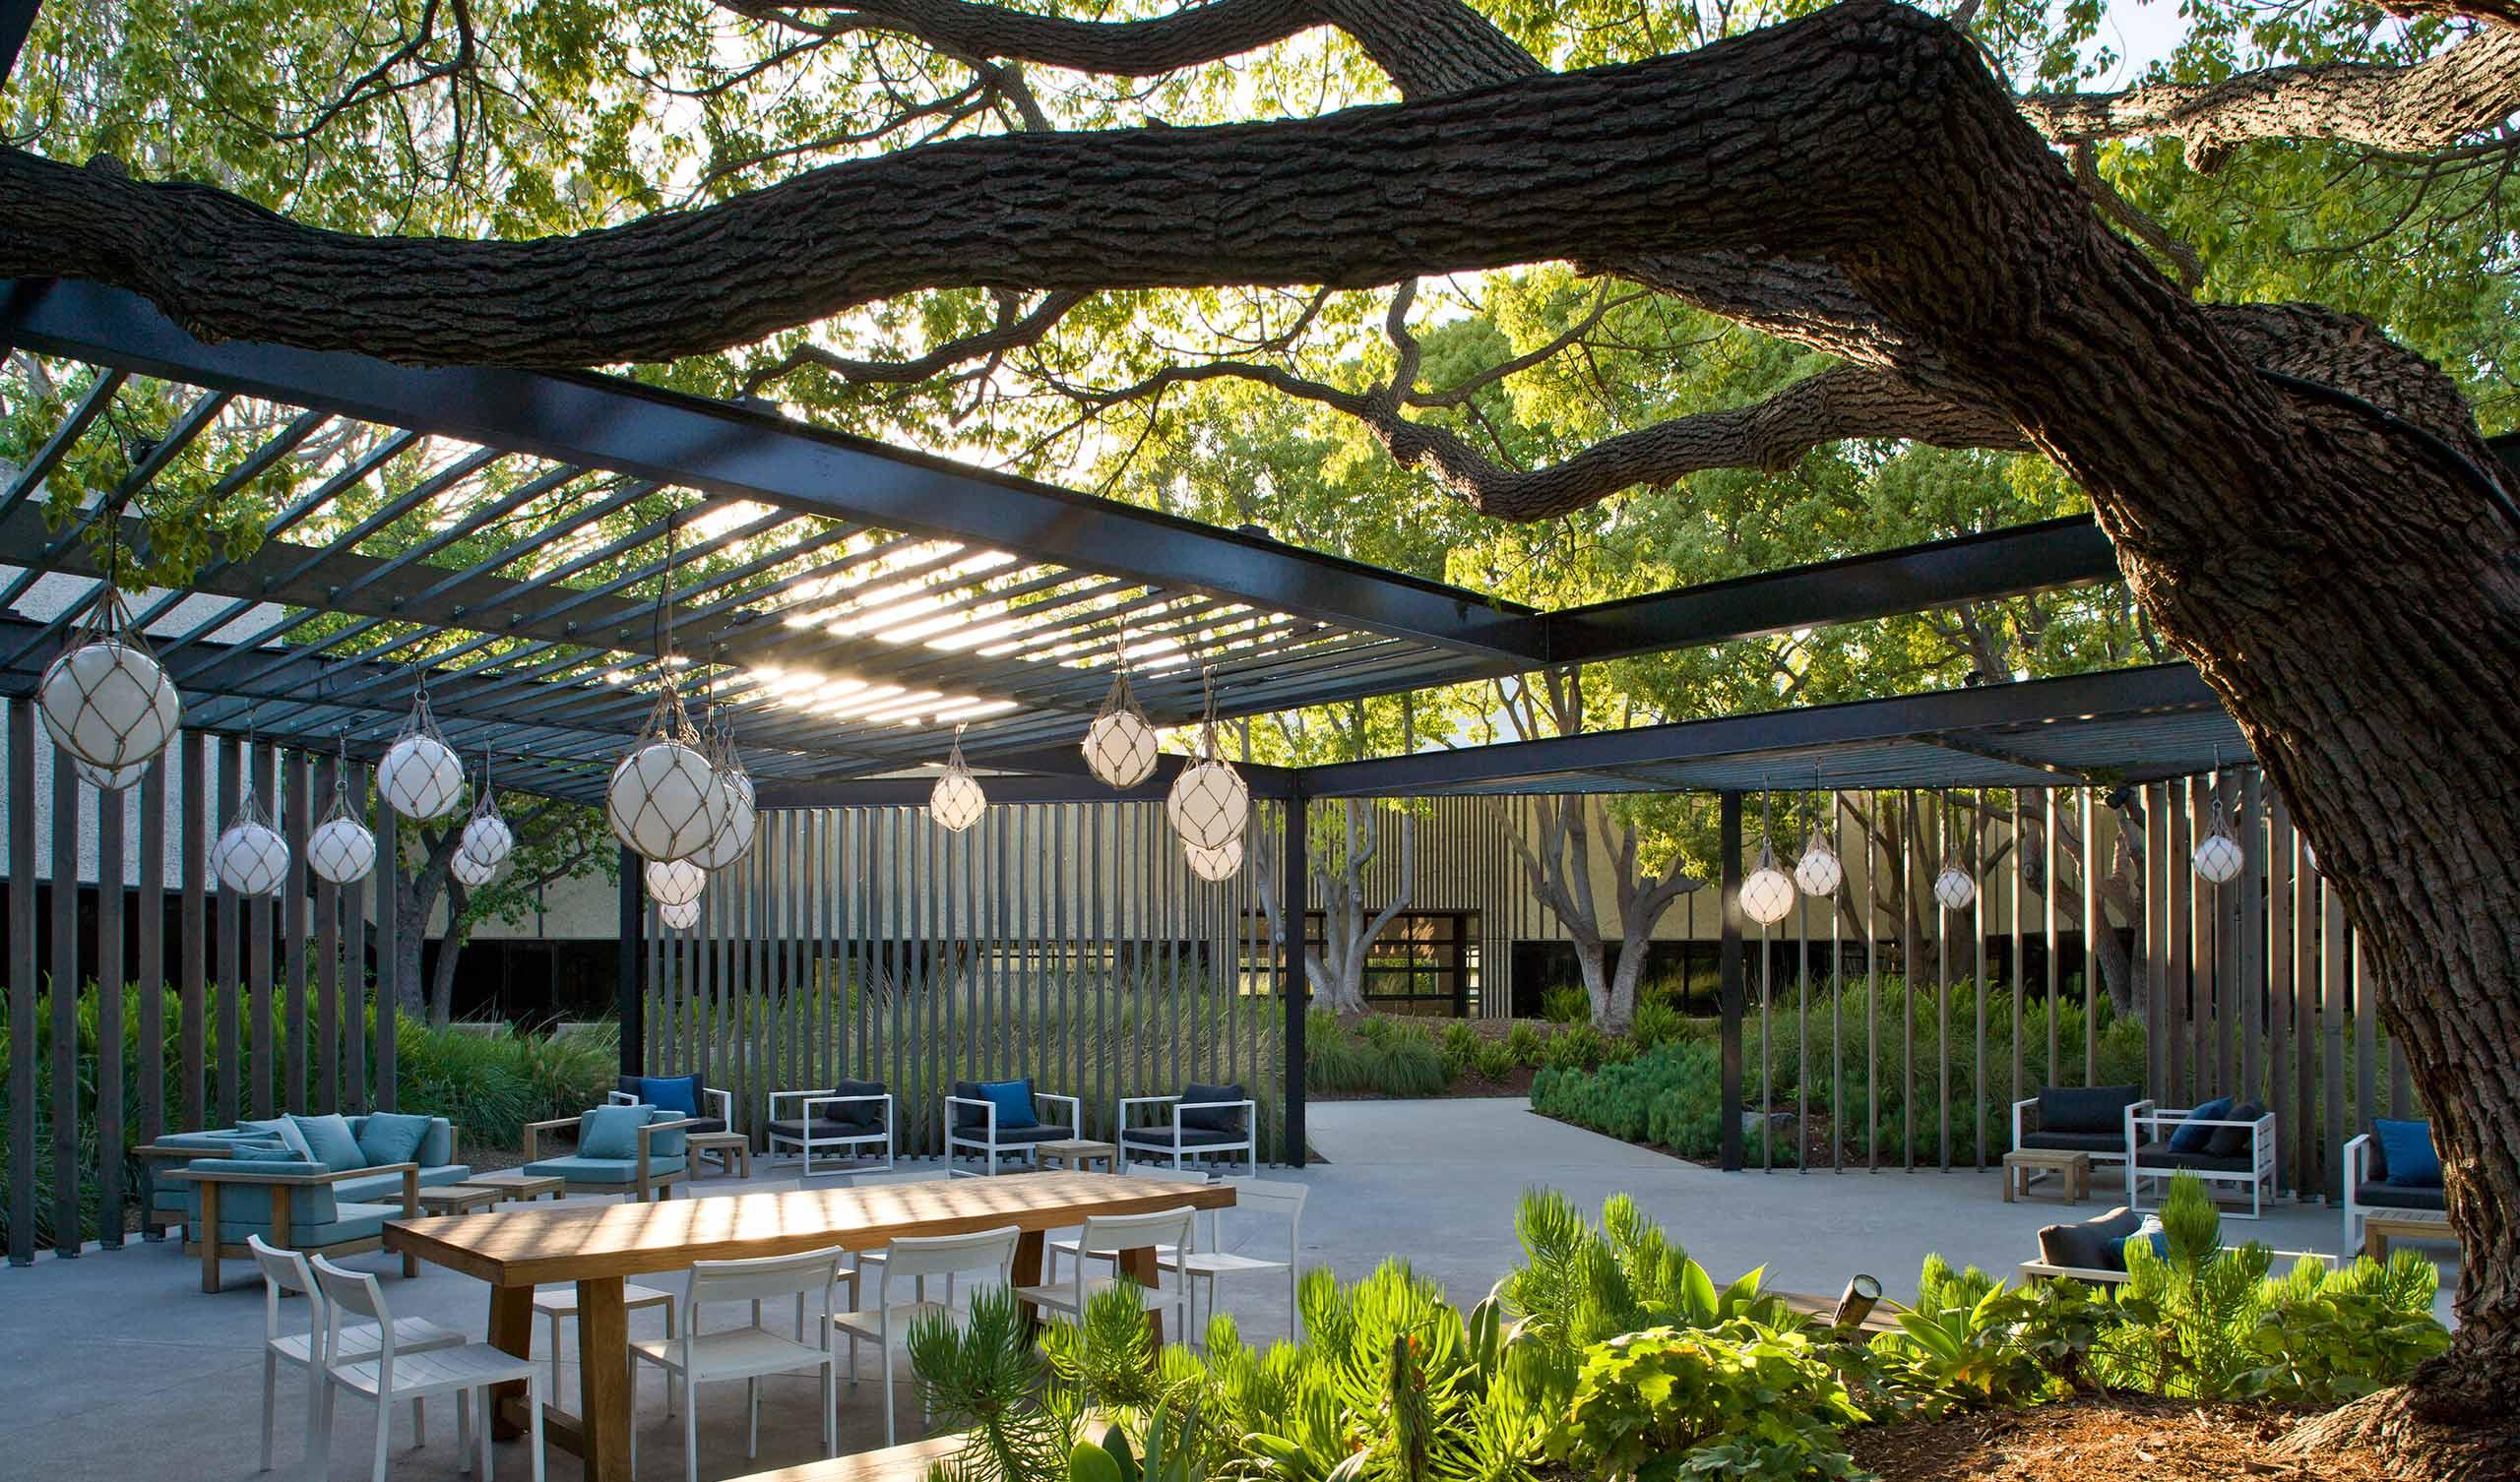 The Yard San Diego garden gathering area